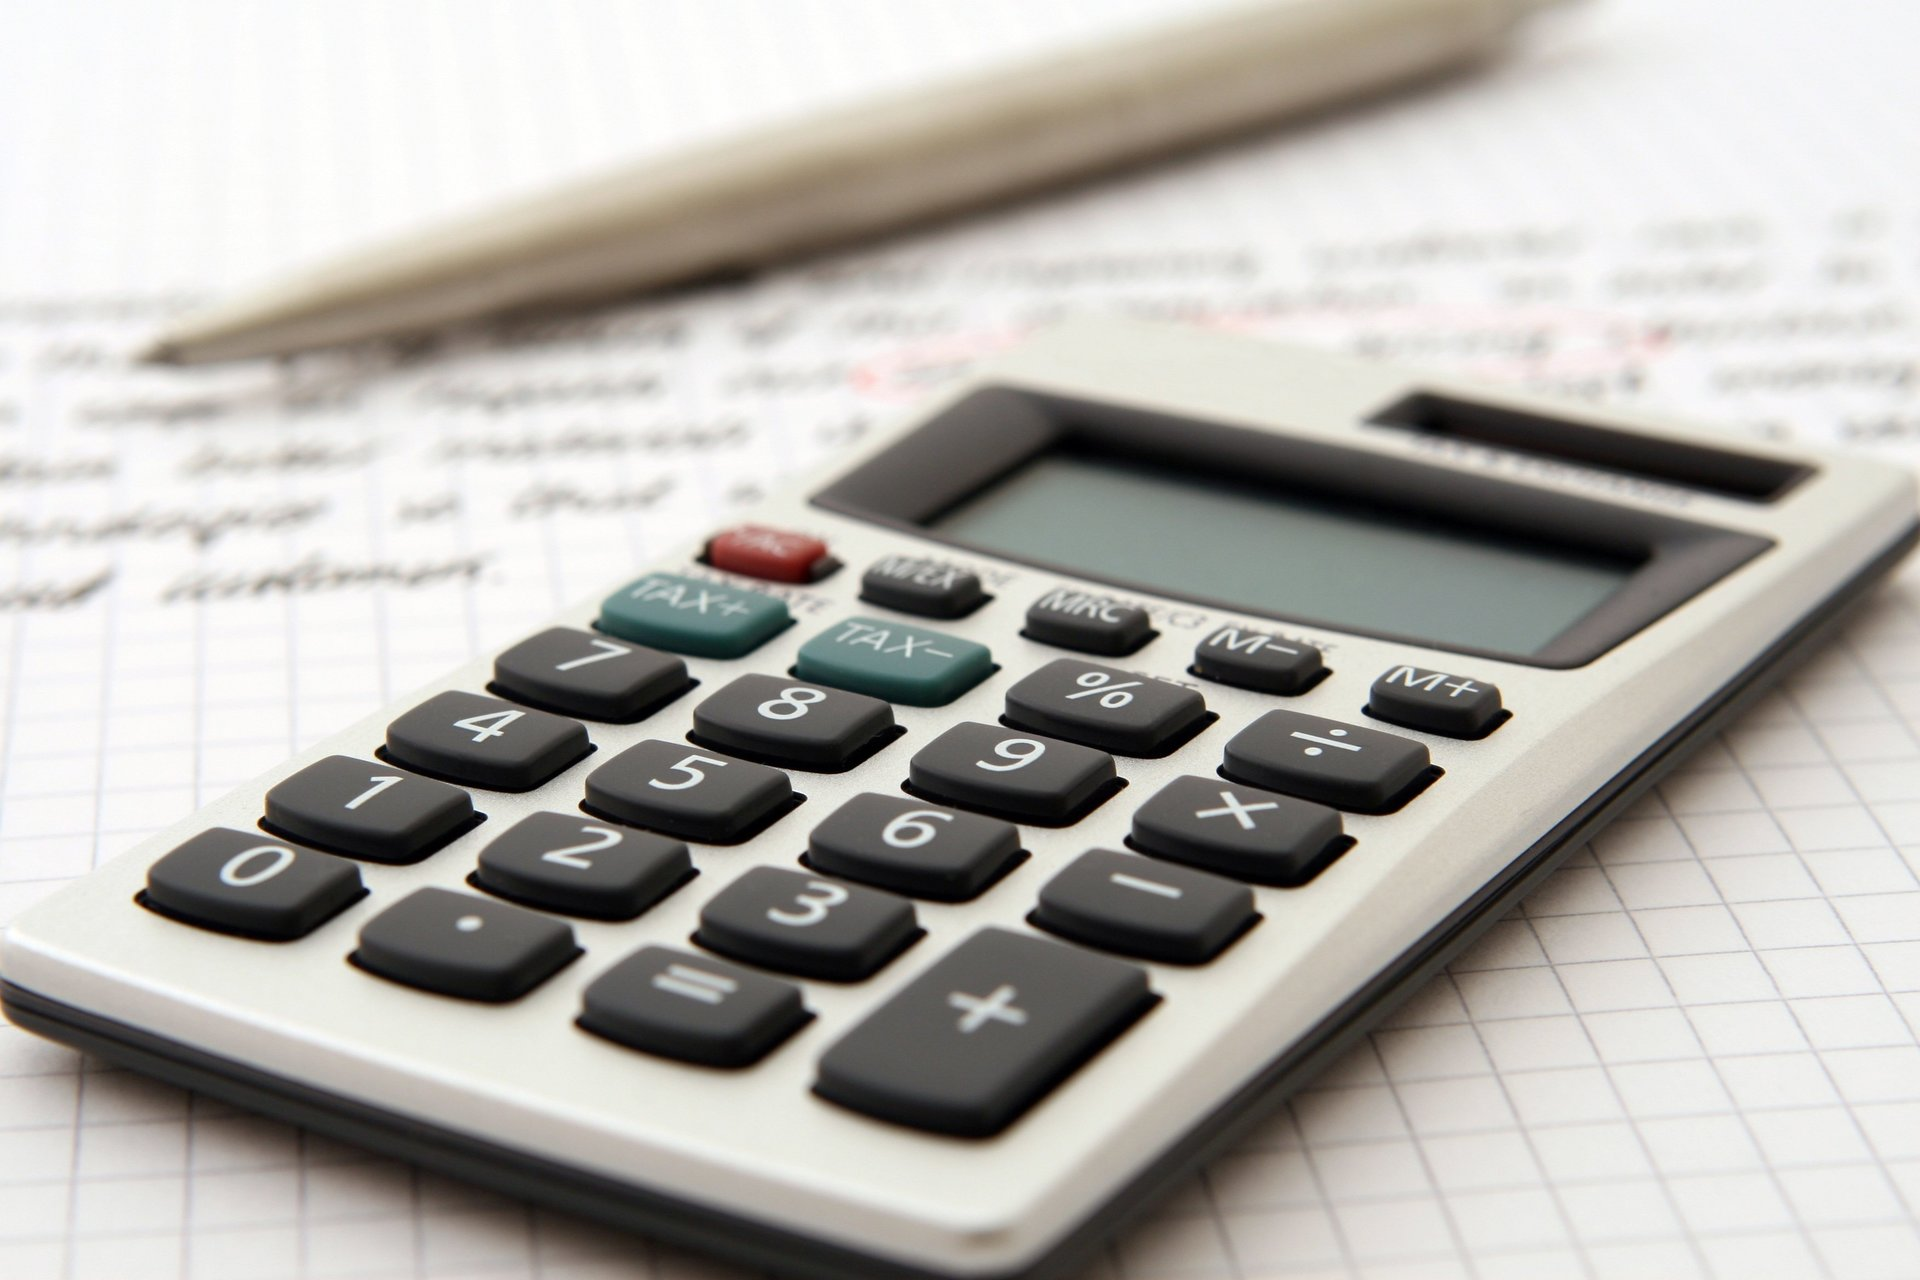 an accountant's calculator